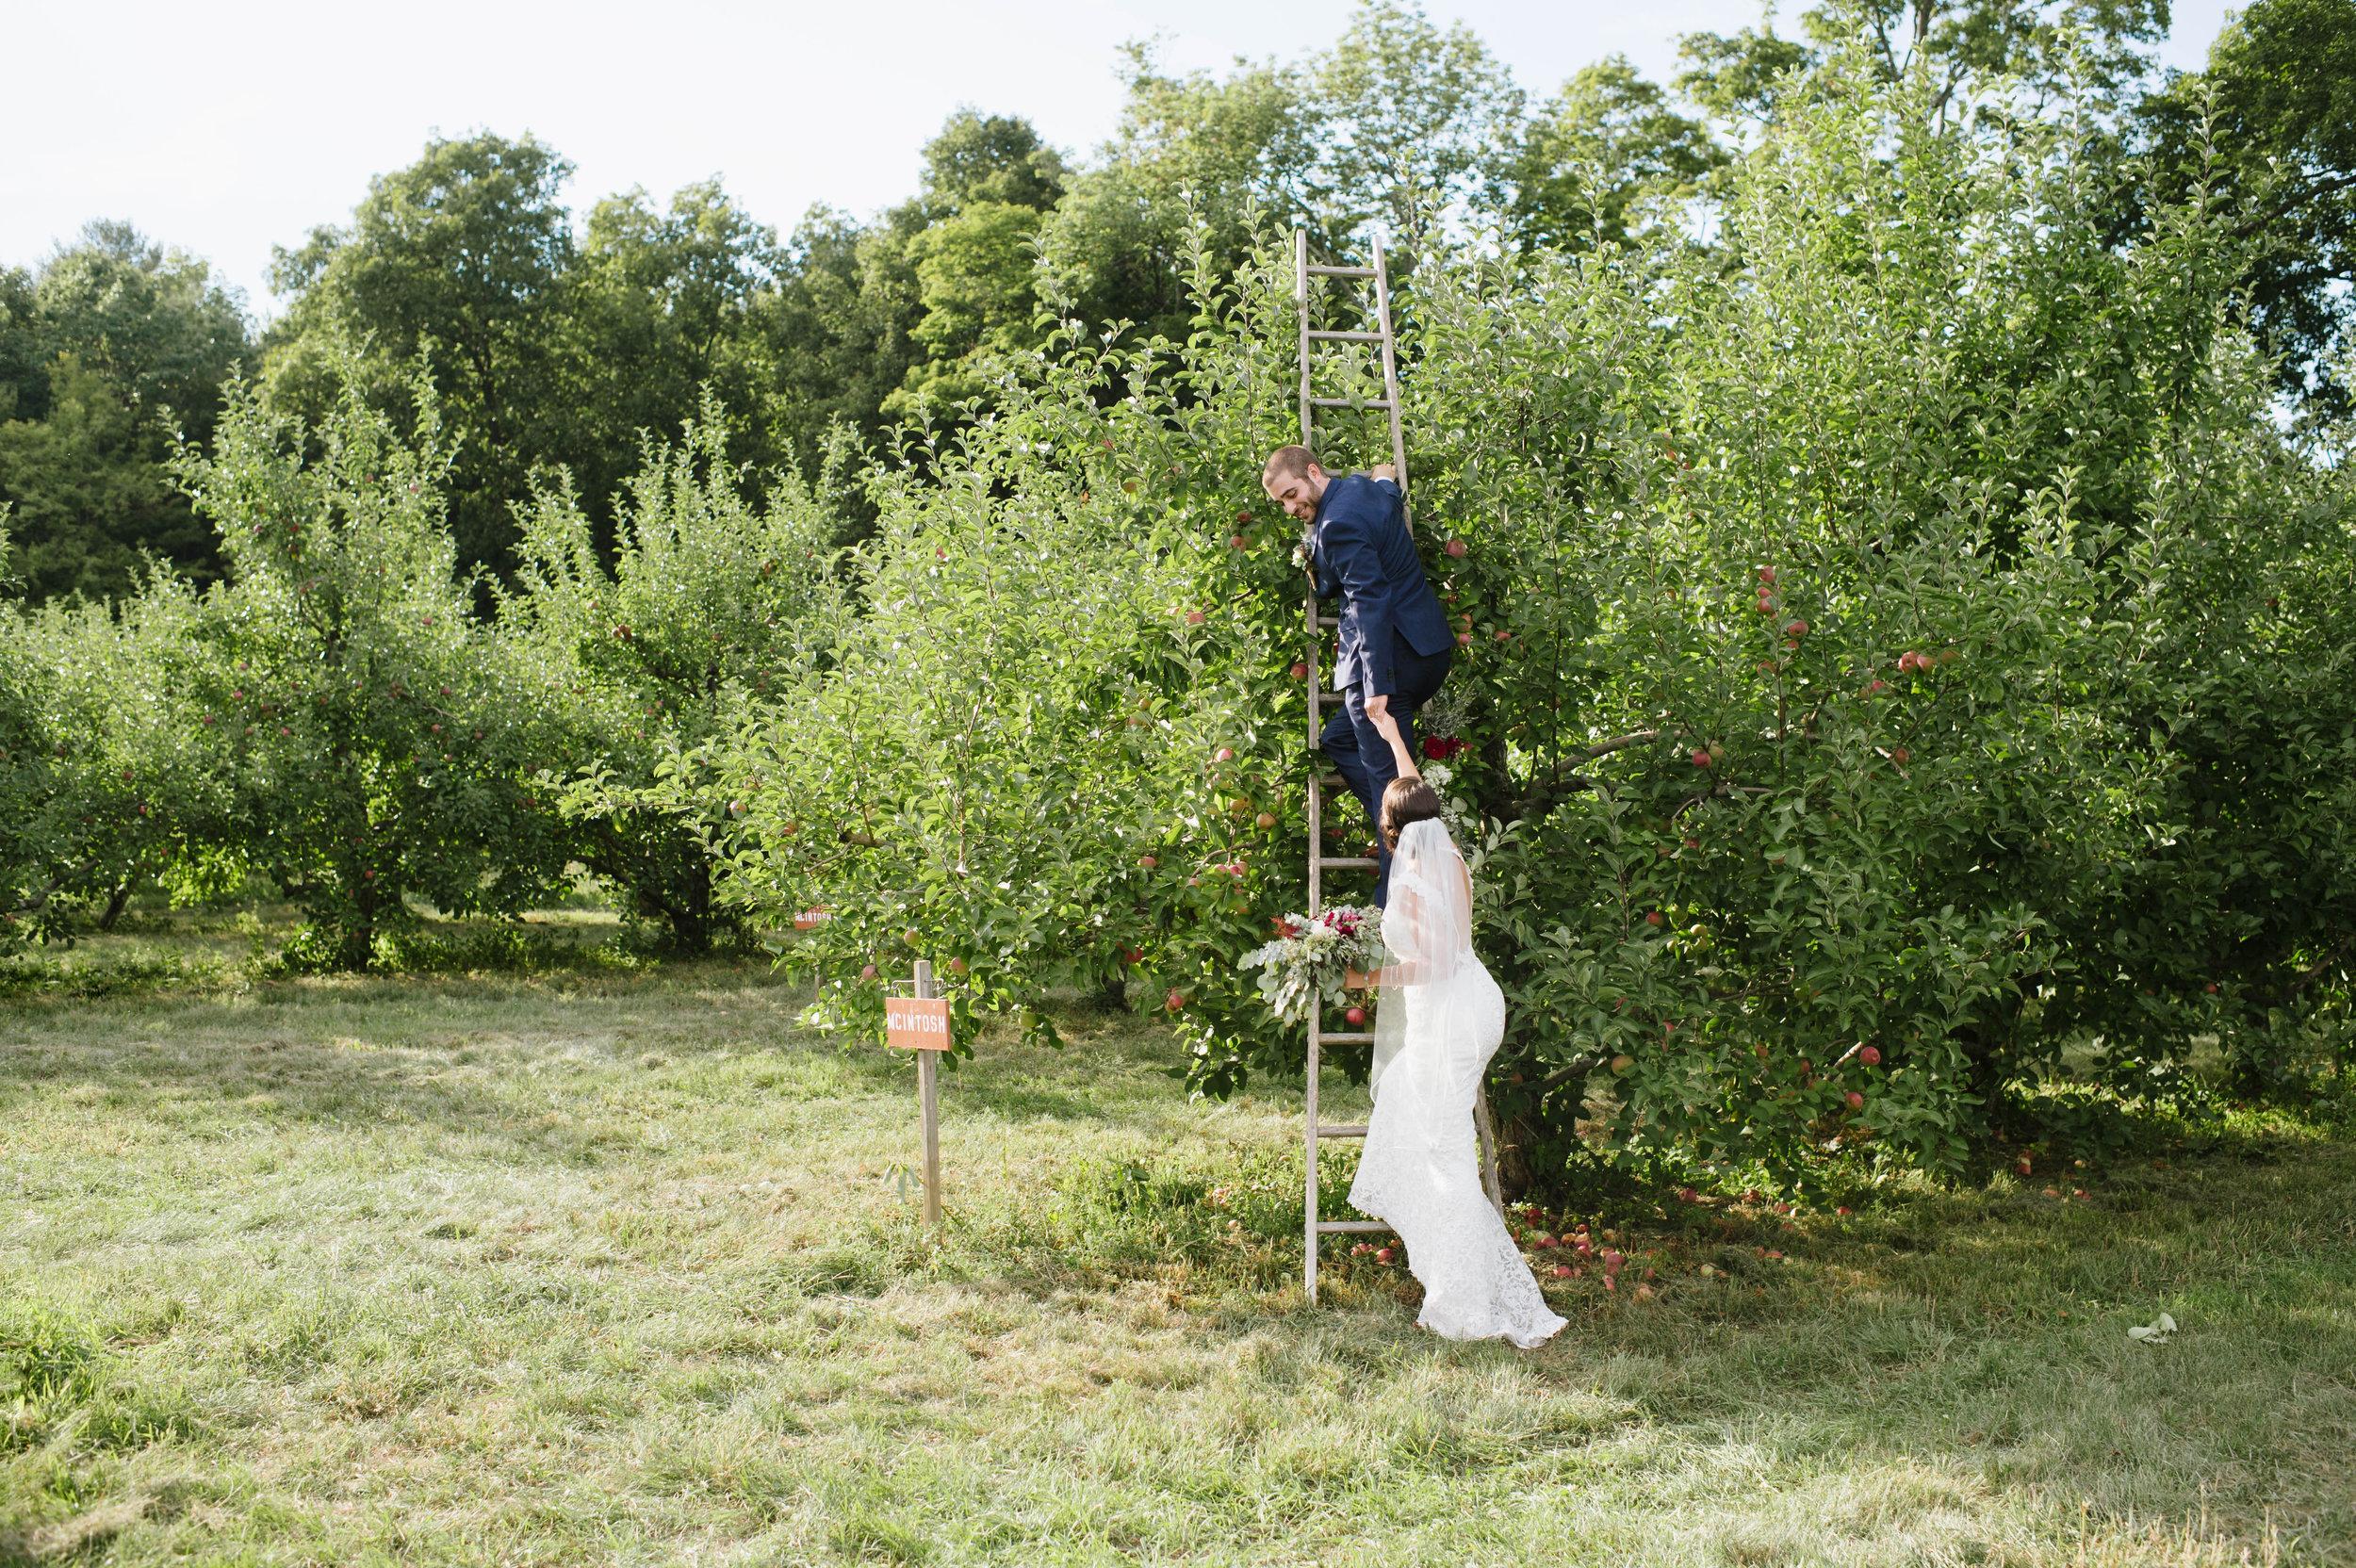 Candid-Wedding-Photography-Boston002.jpg